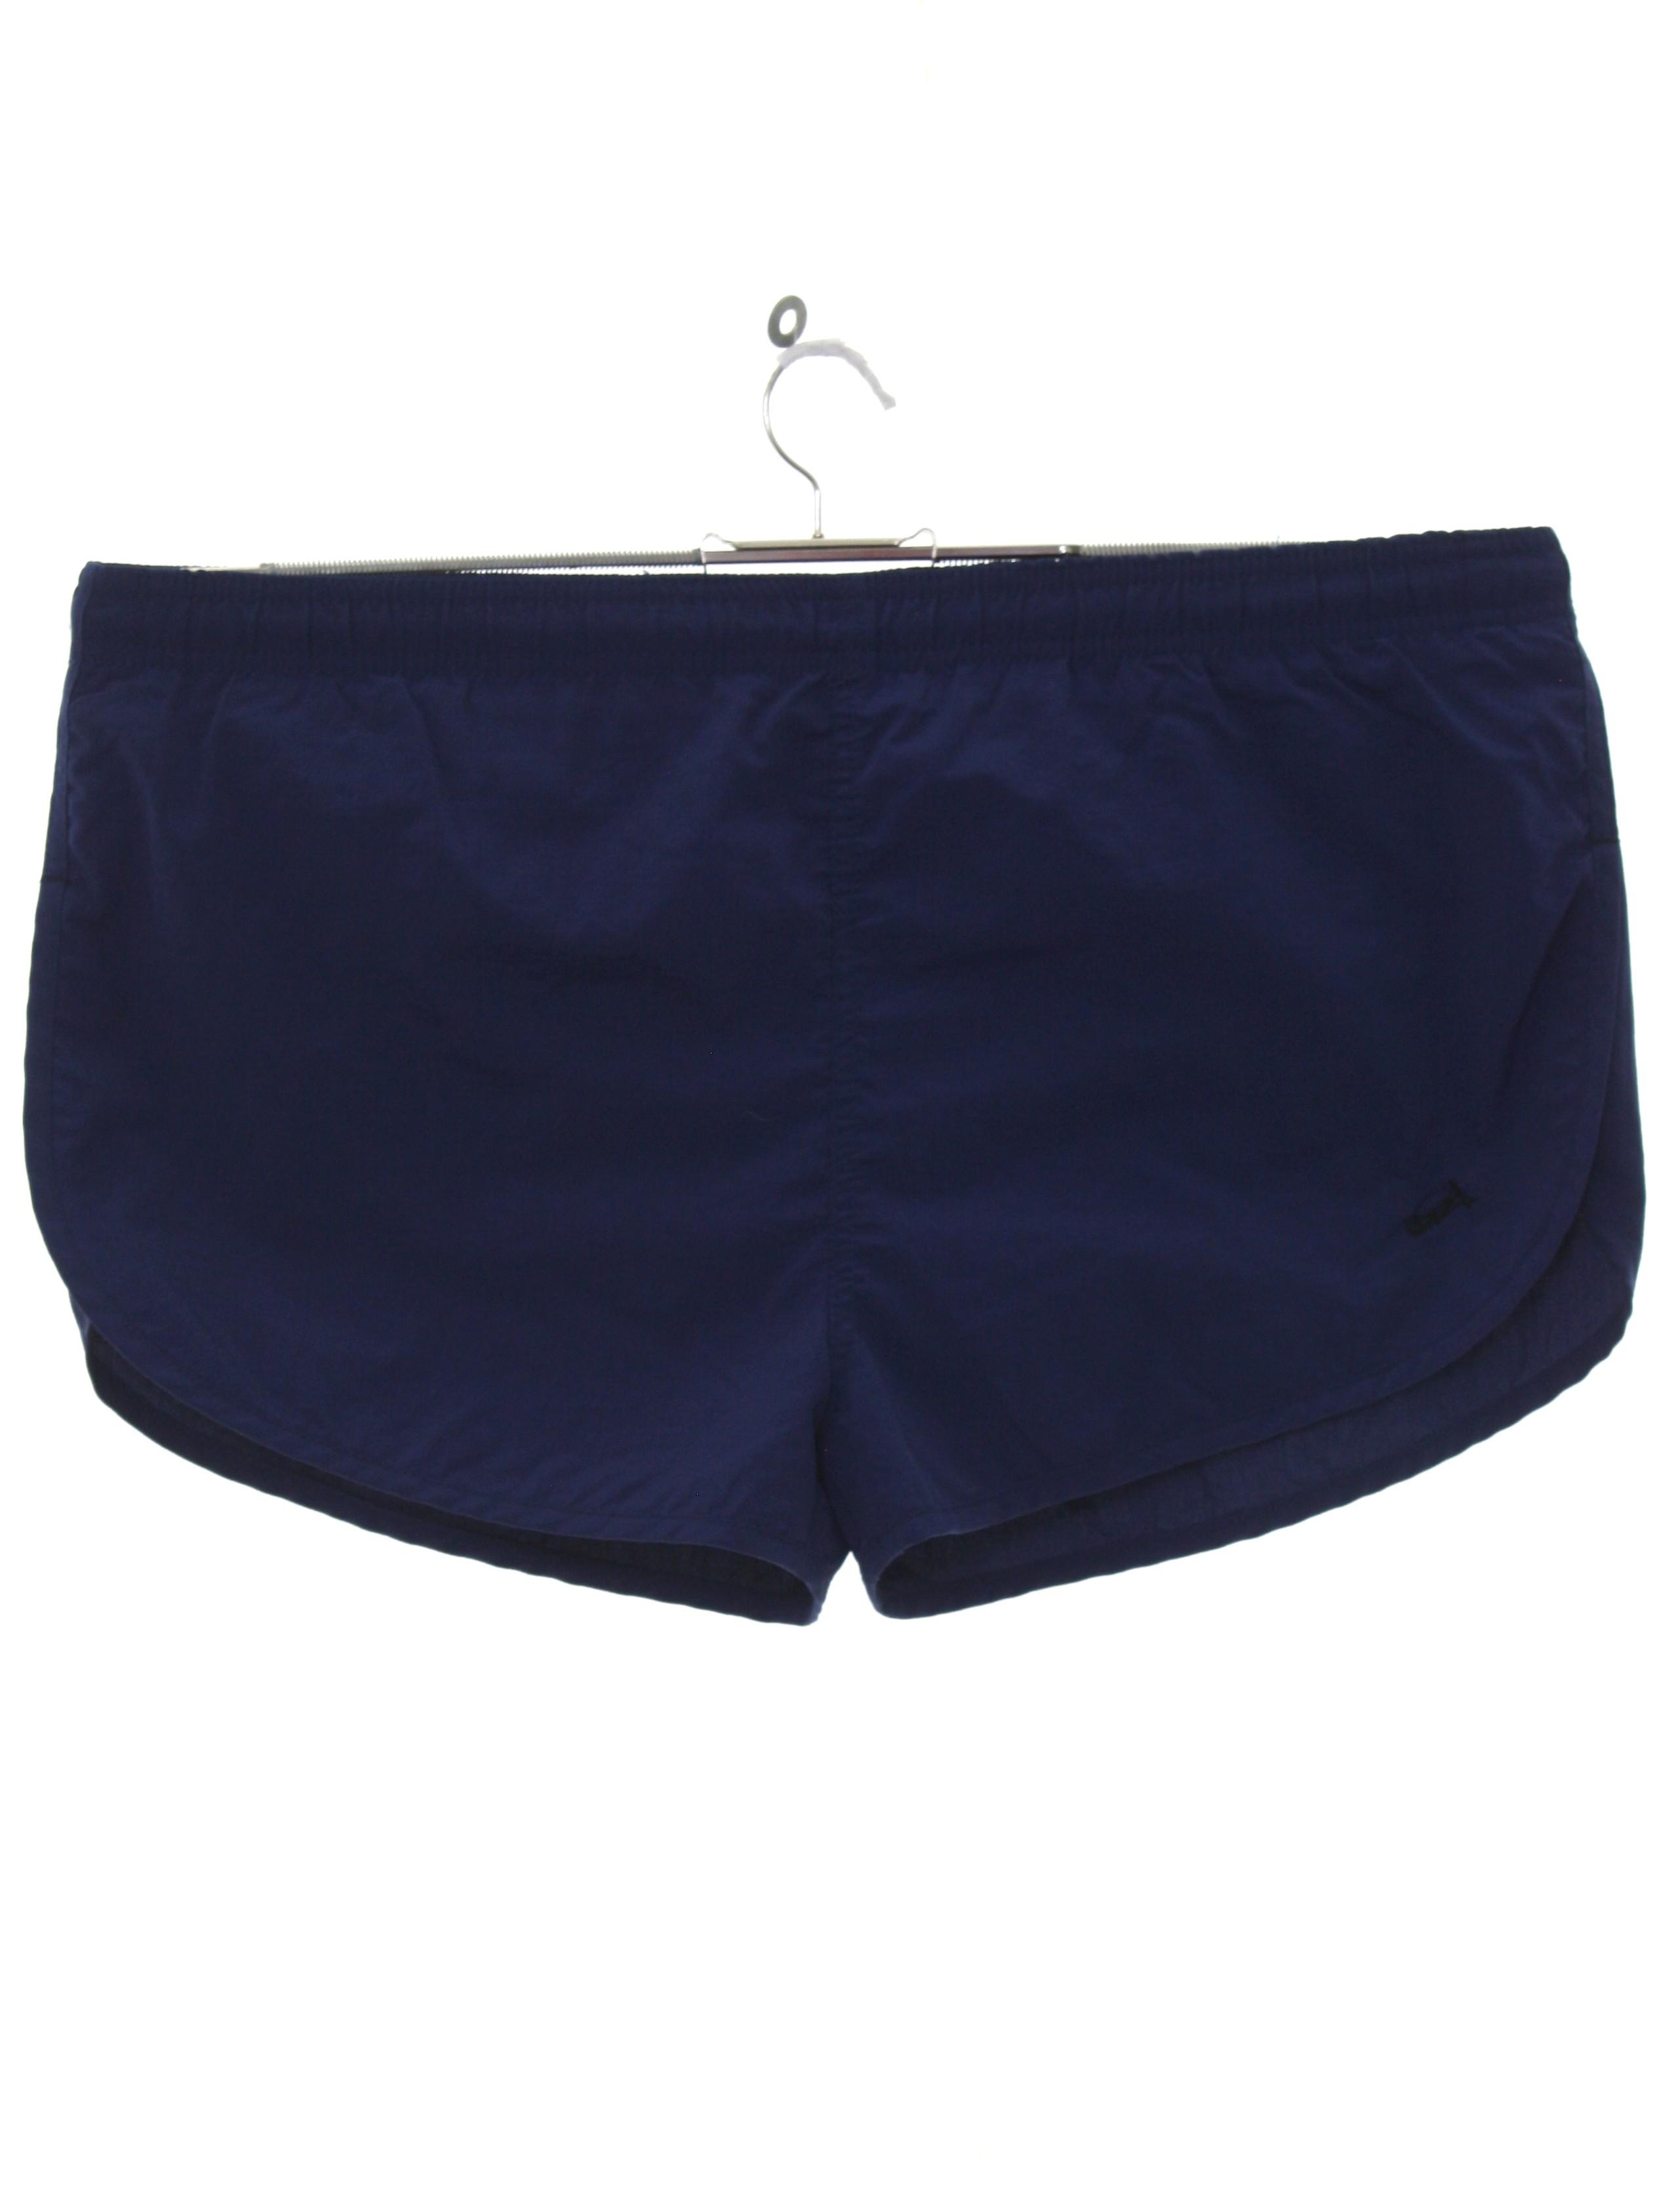 1b61e1a719bef Uzzi 90's Vintage Shorts: 90s -Uzzi- Mens navy blue background nylon ...